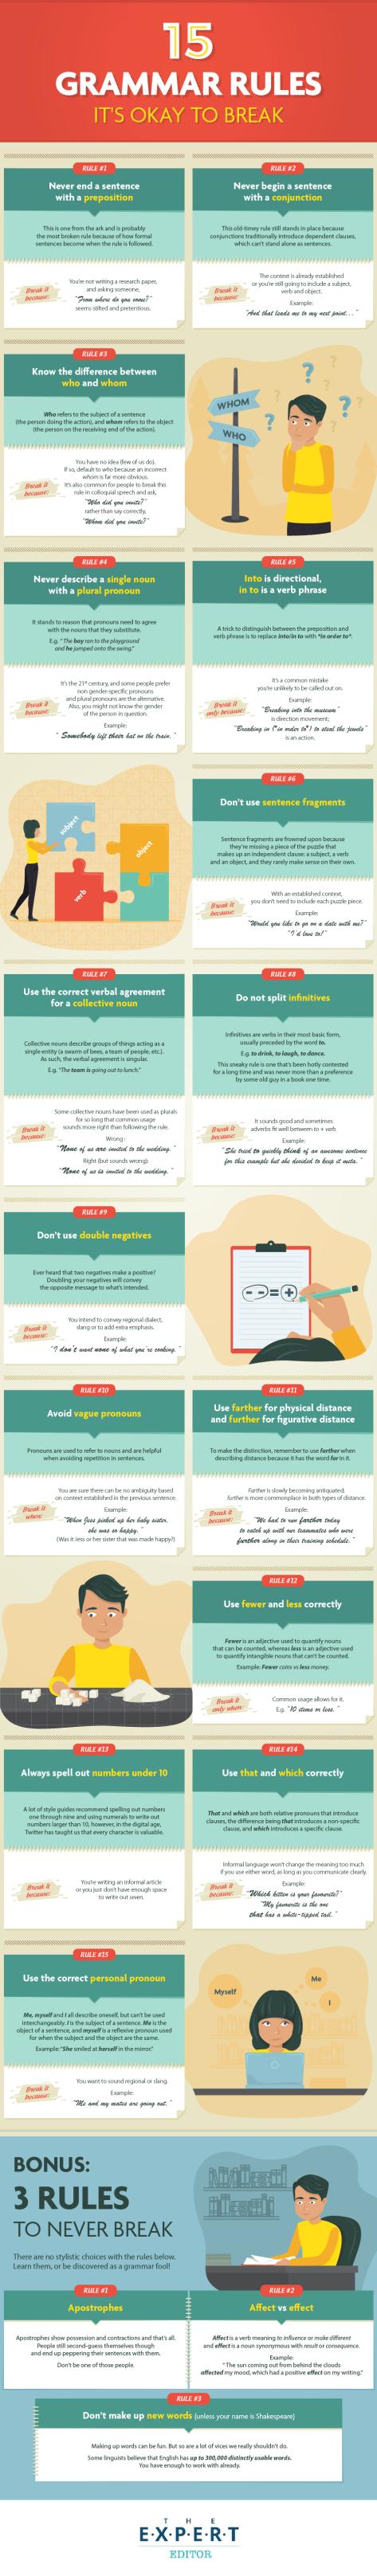 15-Grammar-Rules-It's-Okay-to-Break-infographic